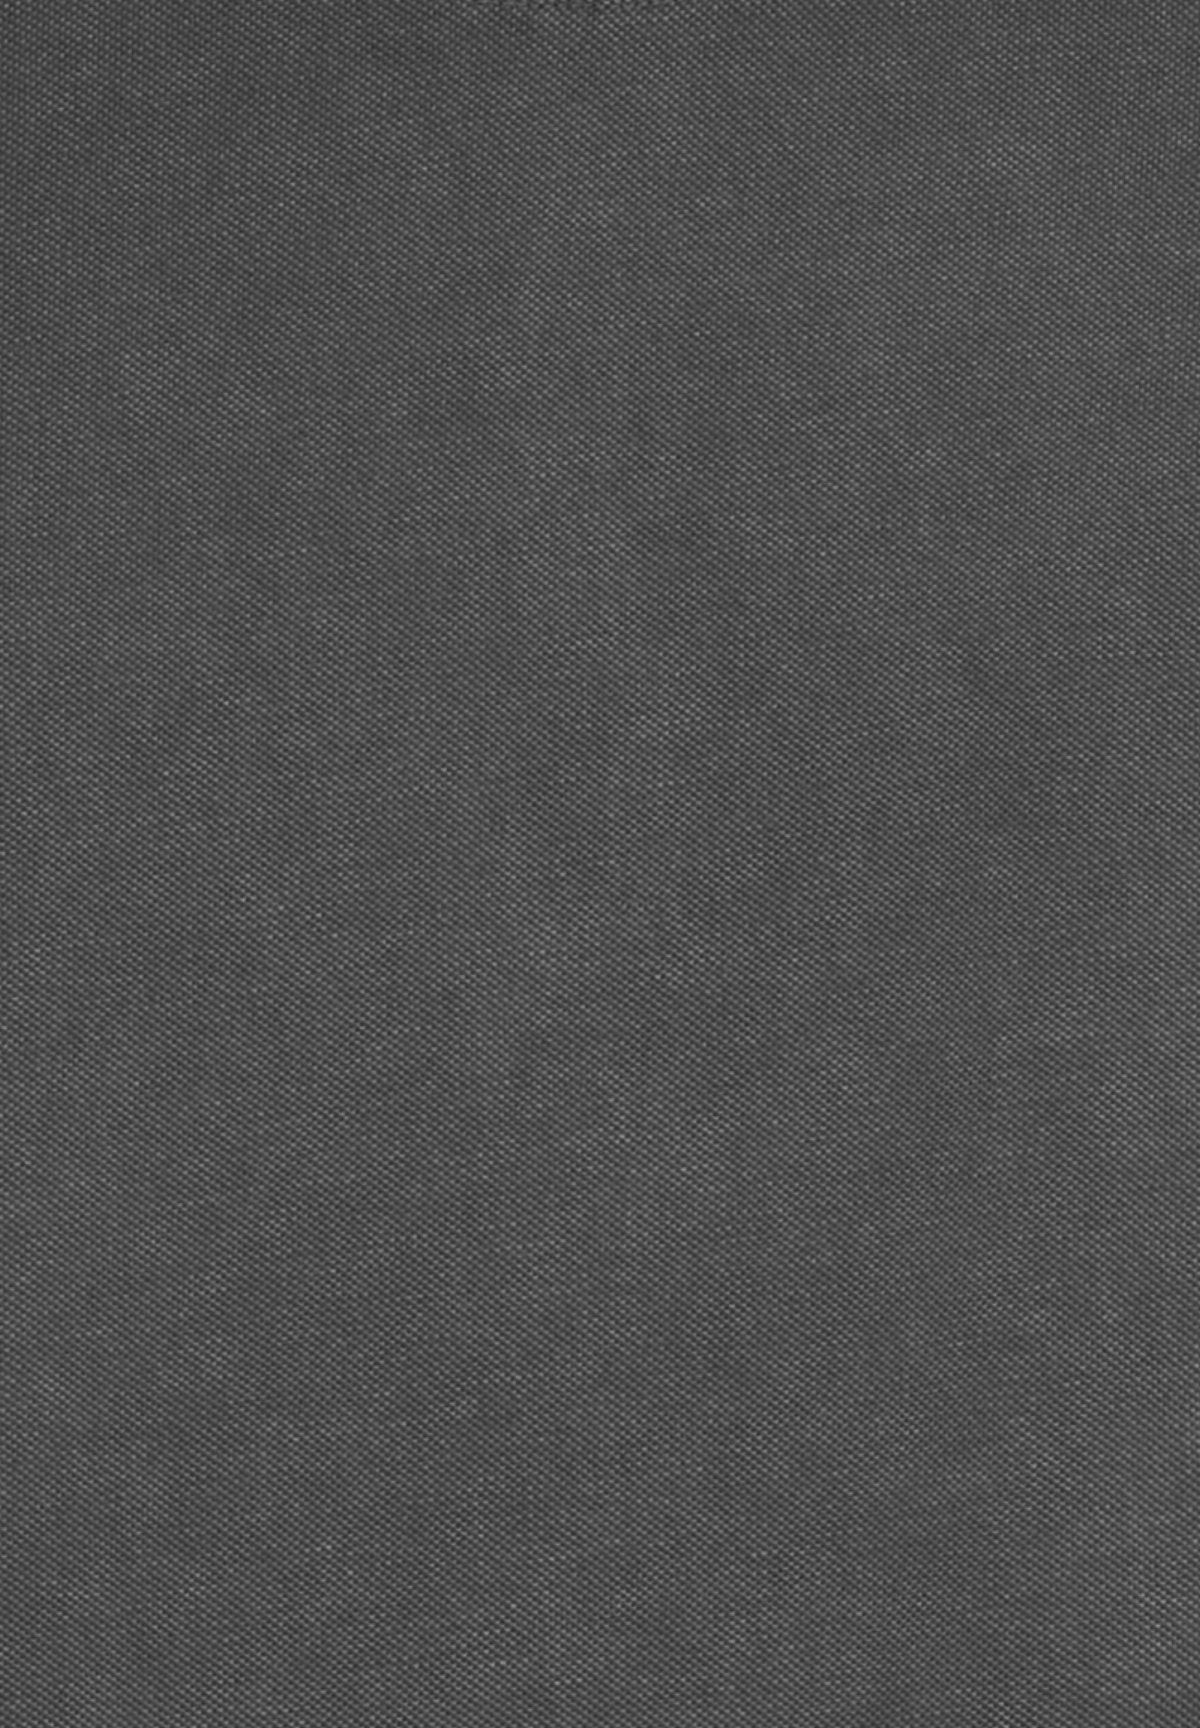 Camel-Active-Herren-Shirt-Poloshirt-Pique-Regular-Fit-NEU Indexbild 51